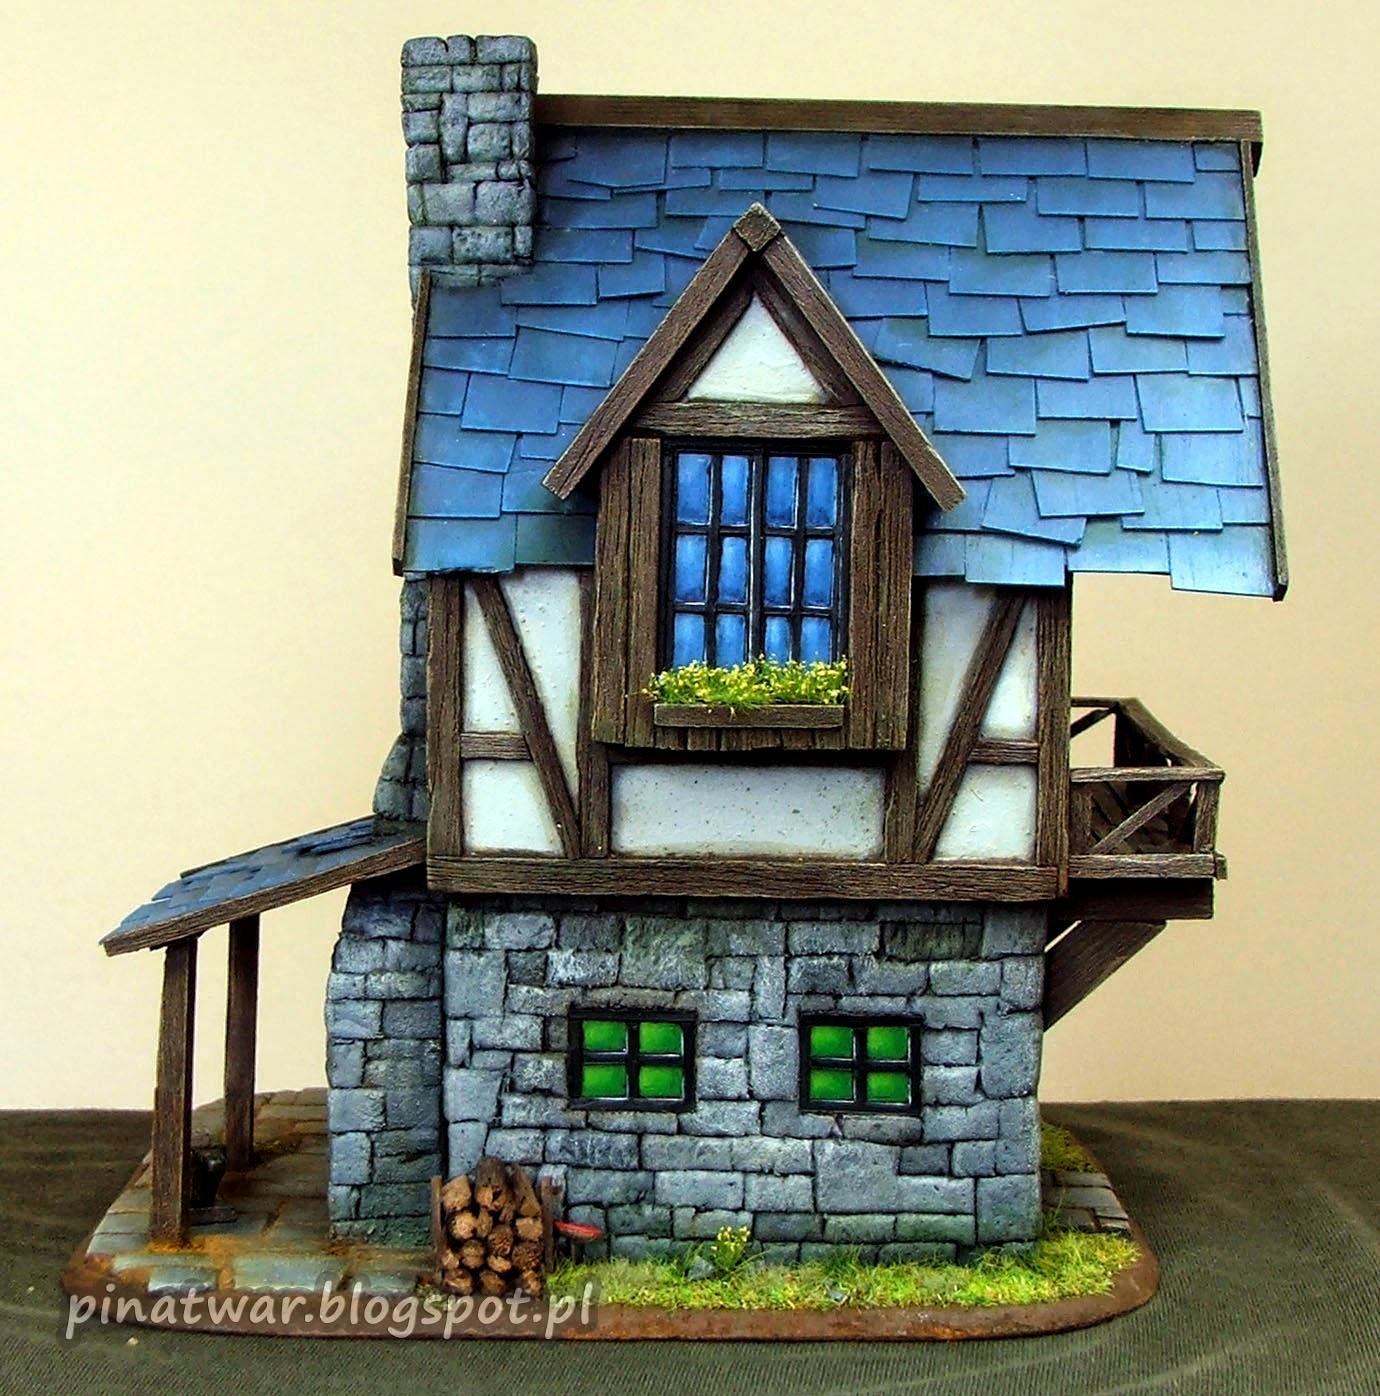 Blacksmith, Forge, House, Terrain, Village